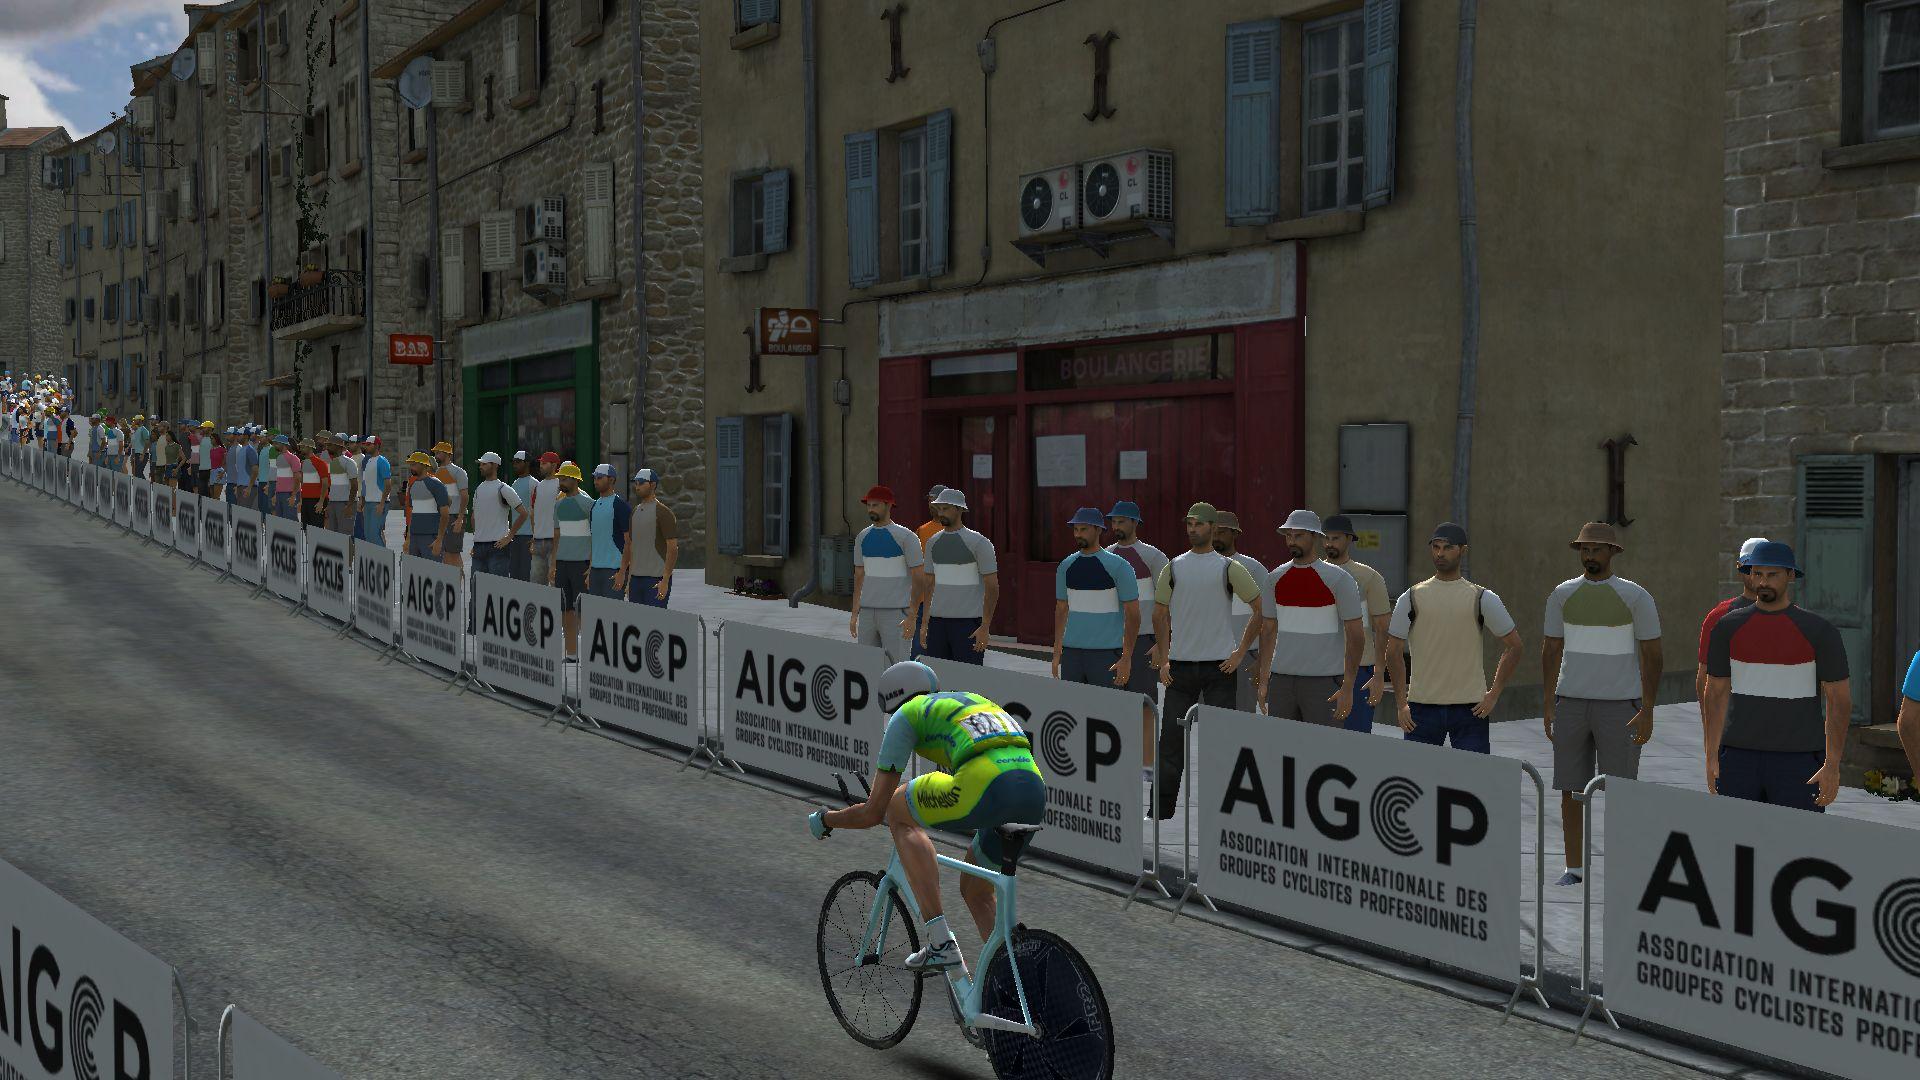 pcmdaily.com/images/mg/2019/Races/GTM/Giro/mg19_giro_09_PCM0019.jpg